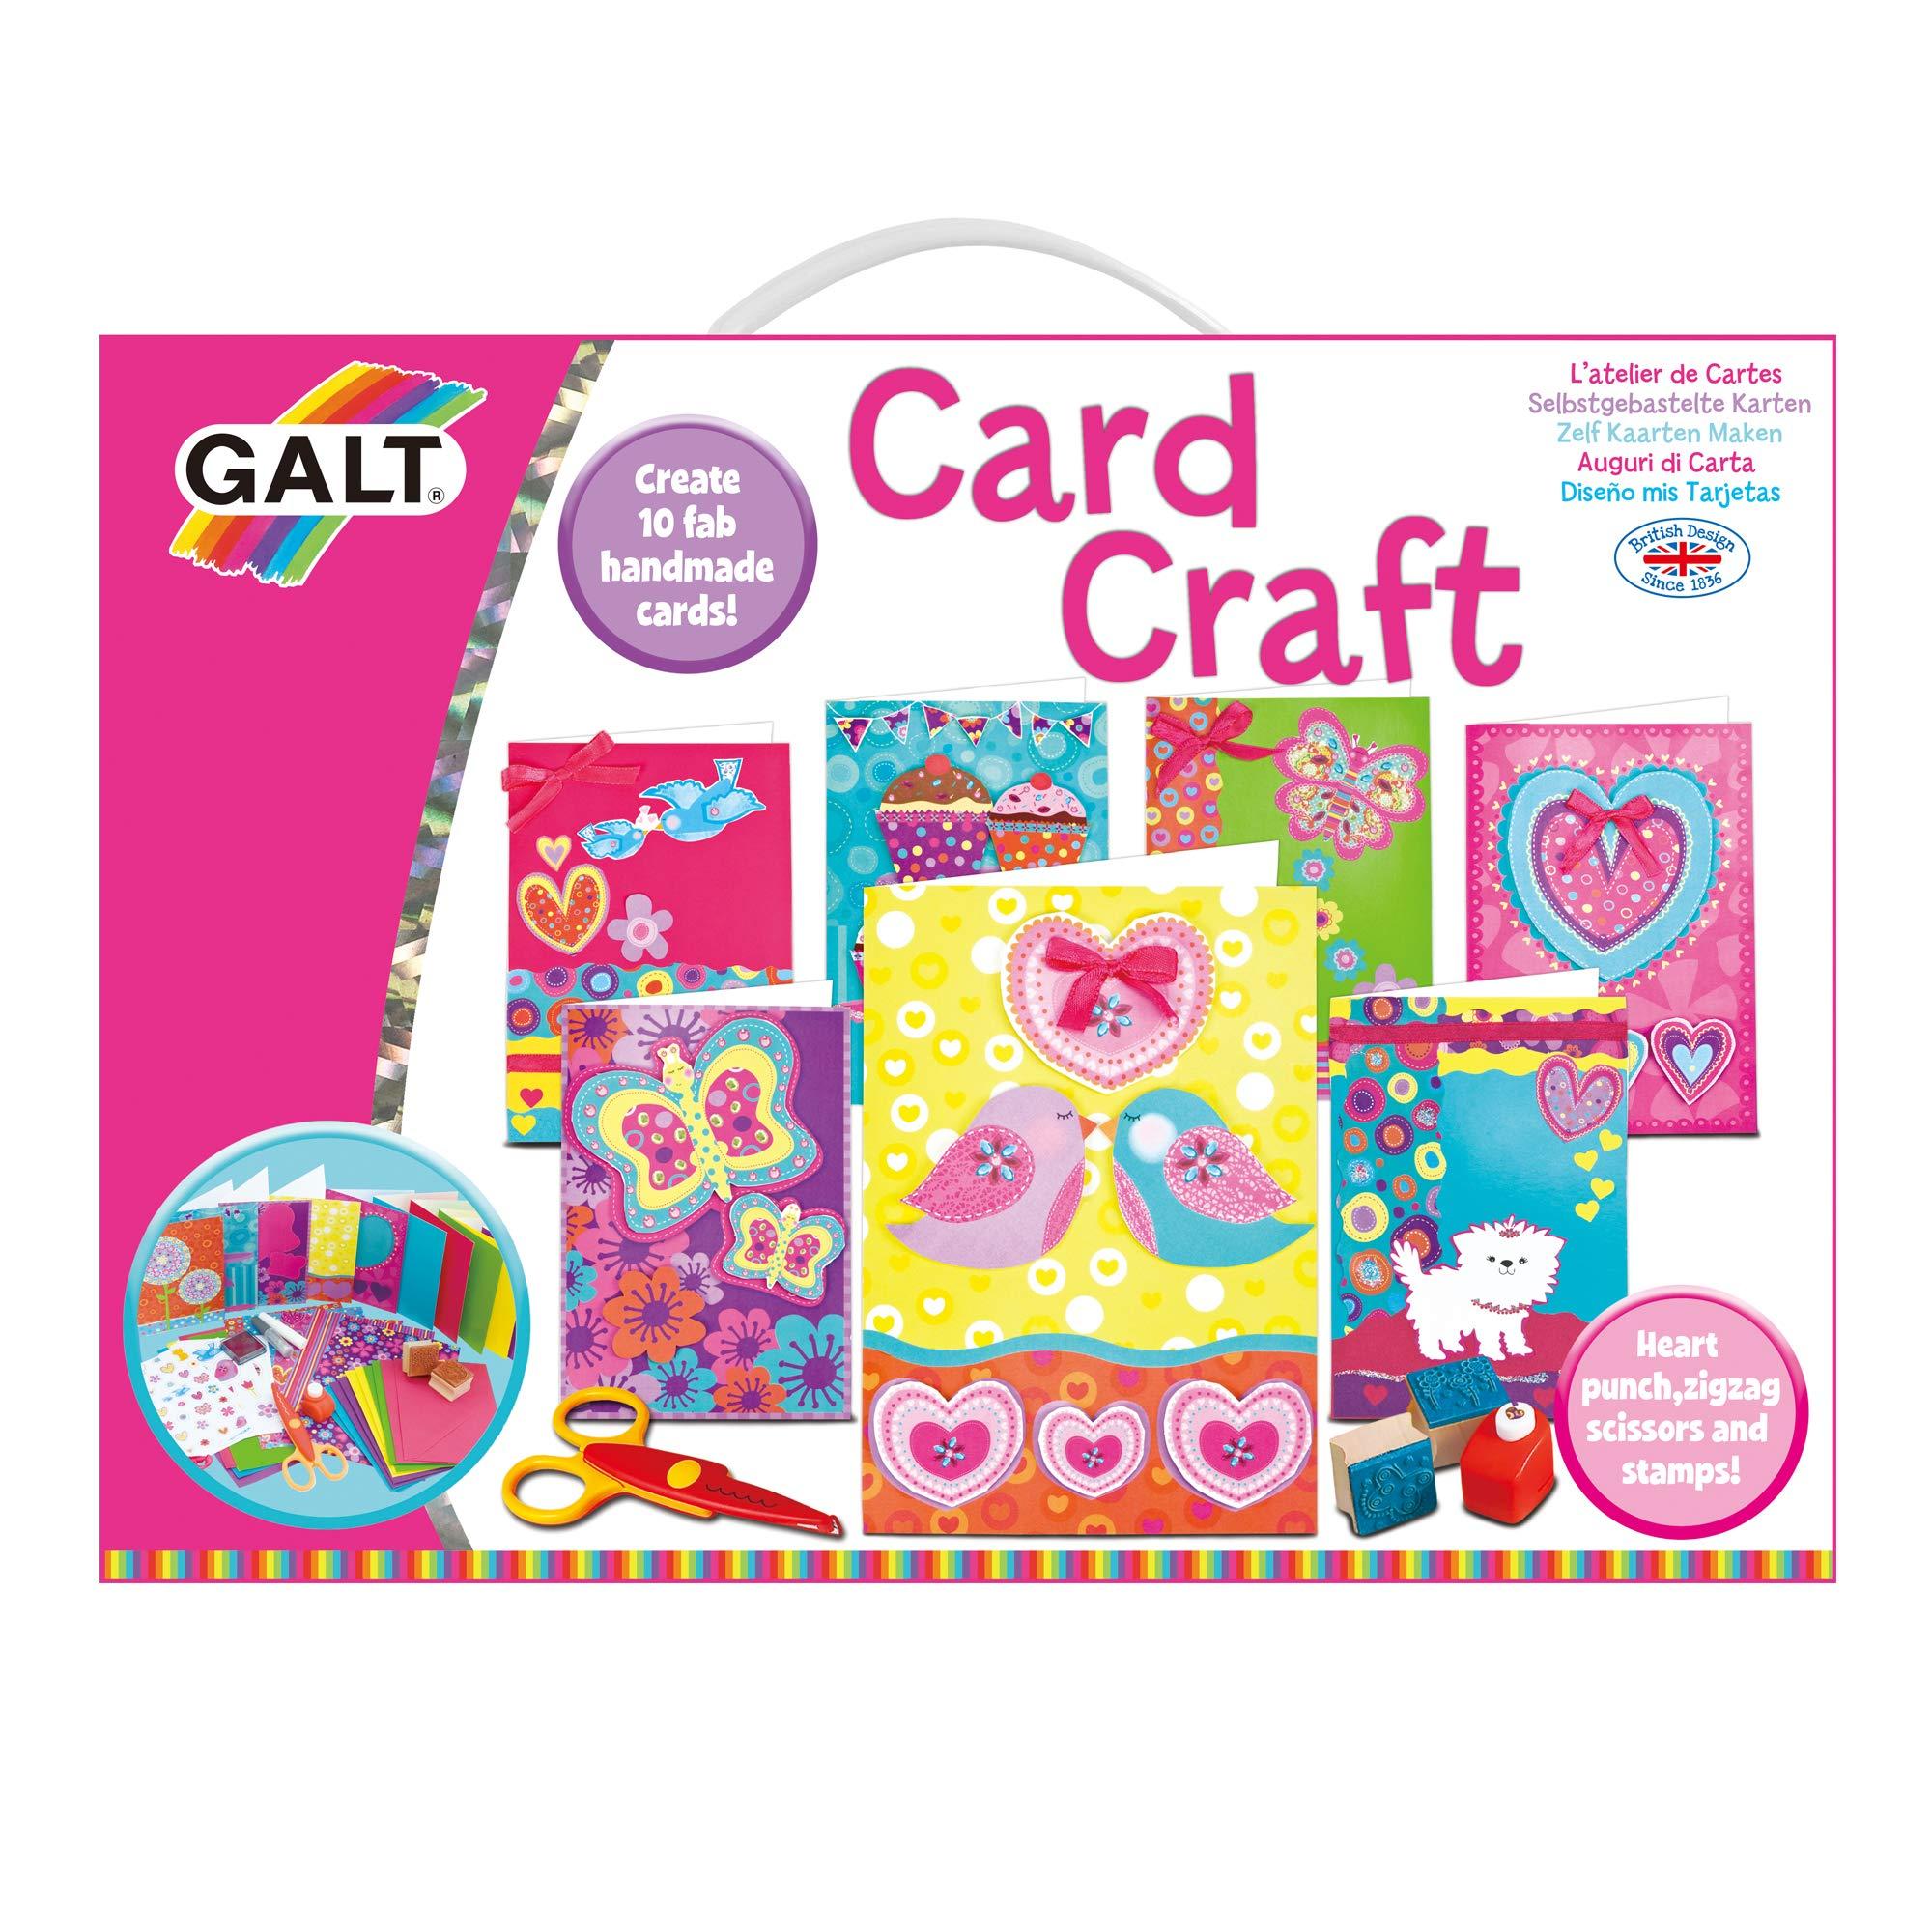 Galt Toys Diseño mis Tarjetas 1003418 product image